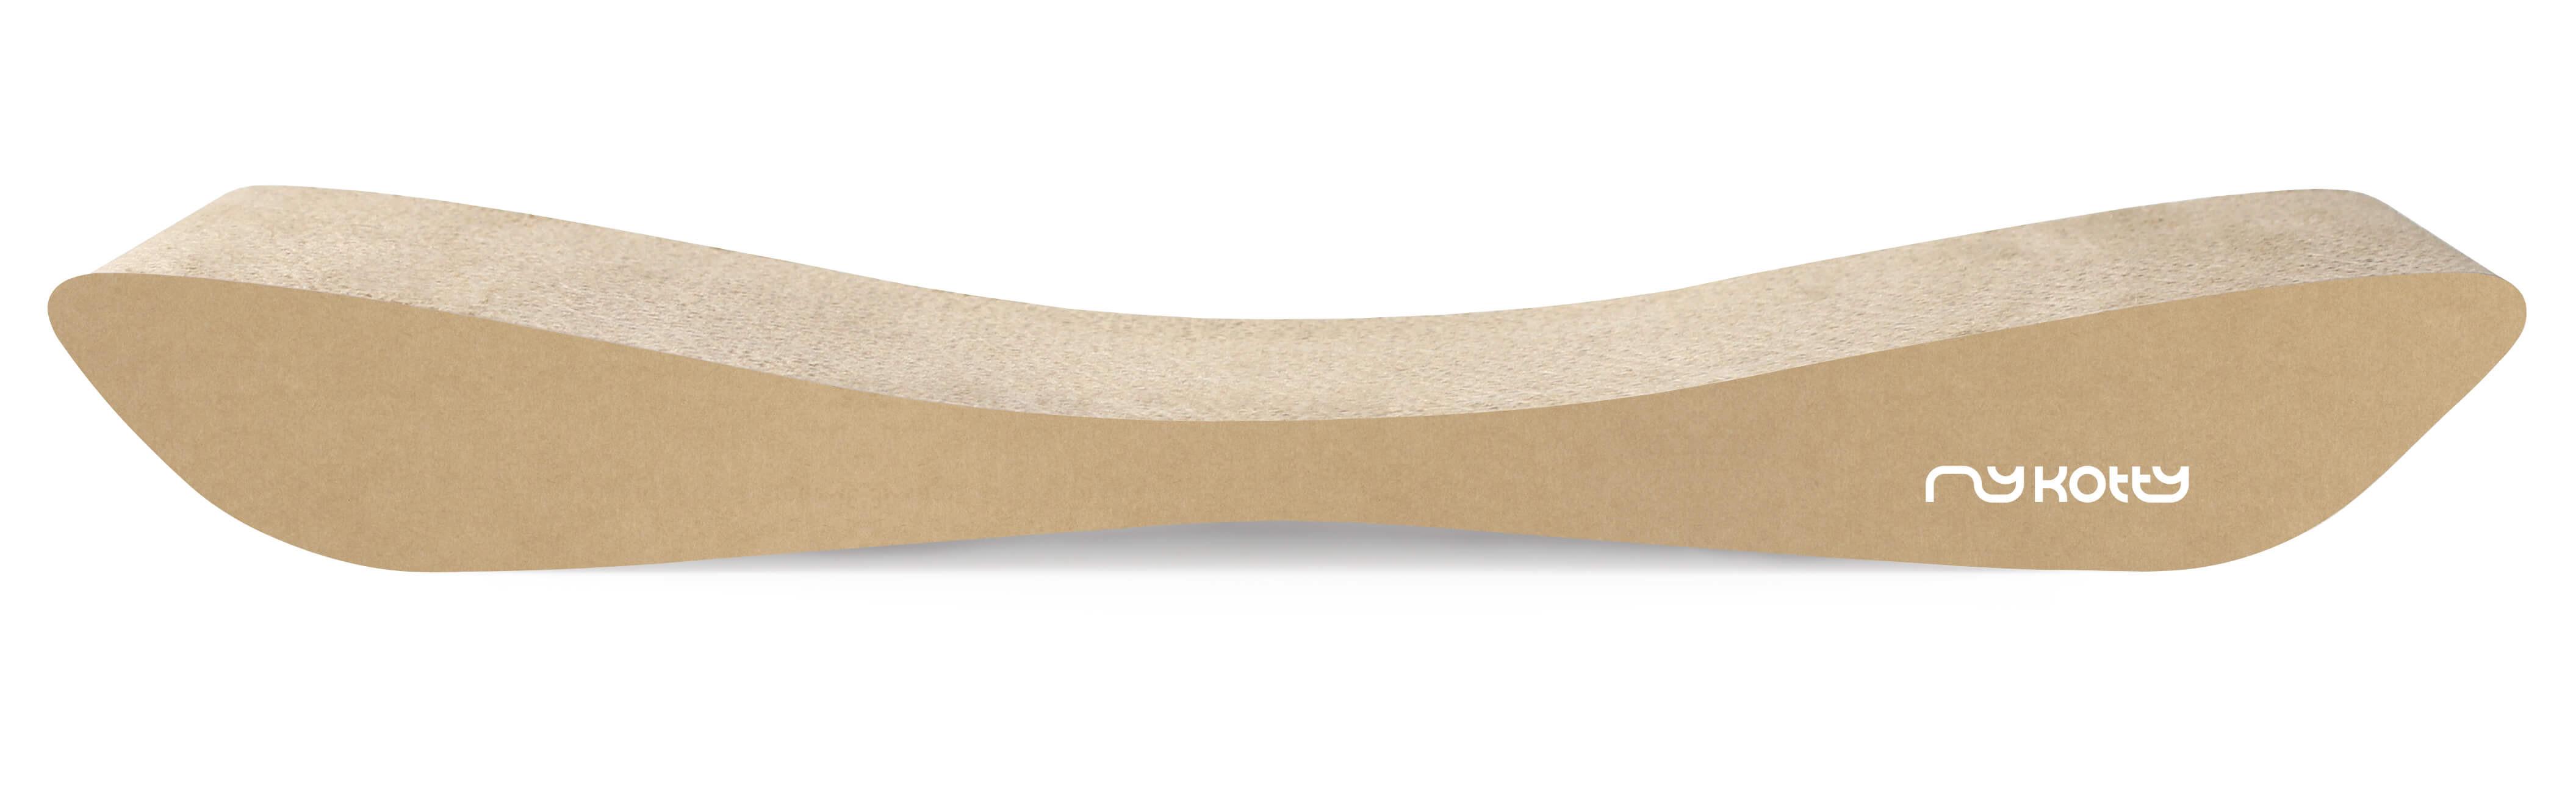 MyCotty TOBI - Kartonnen Krabmeubel